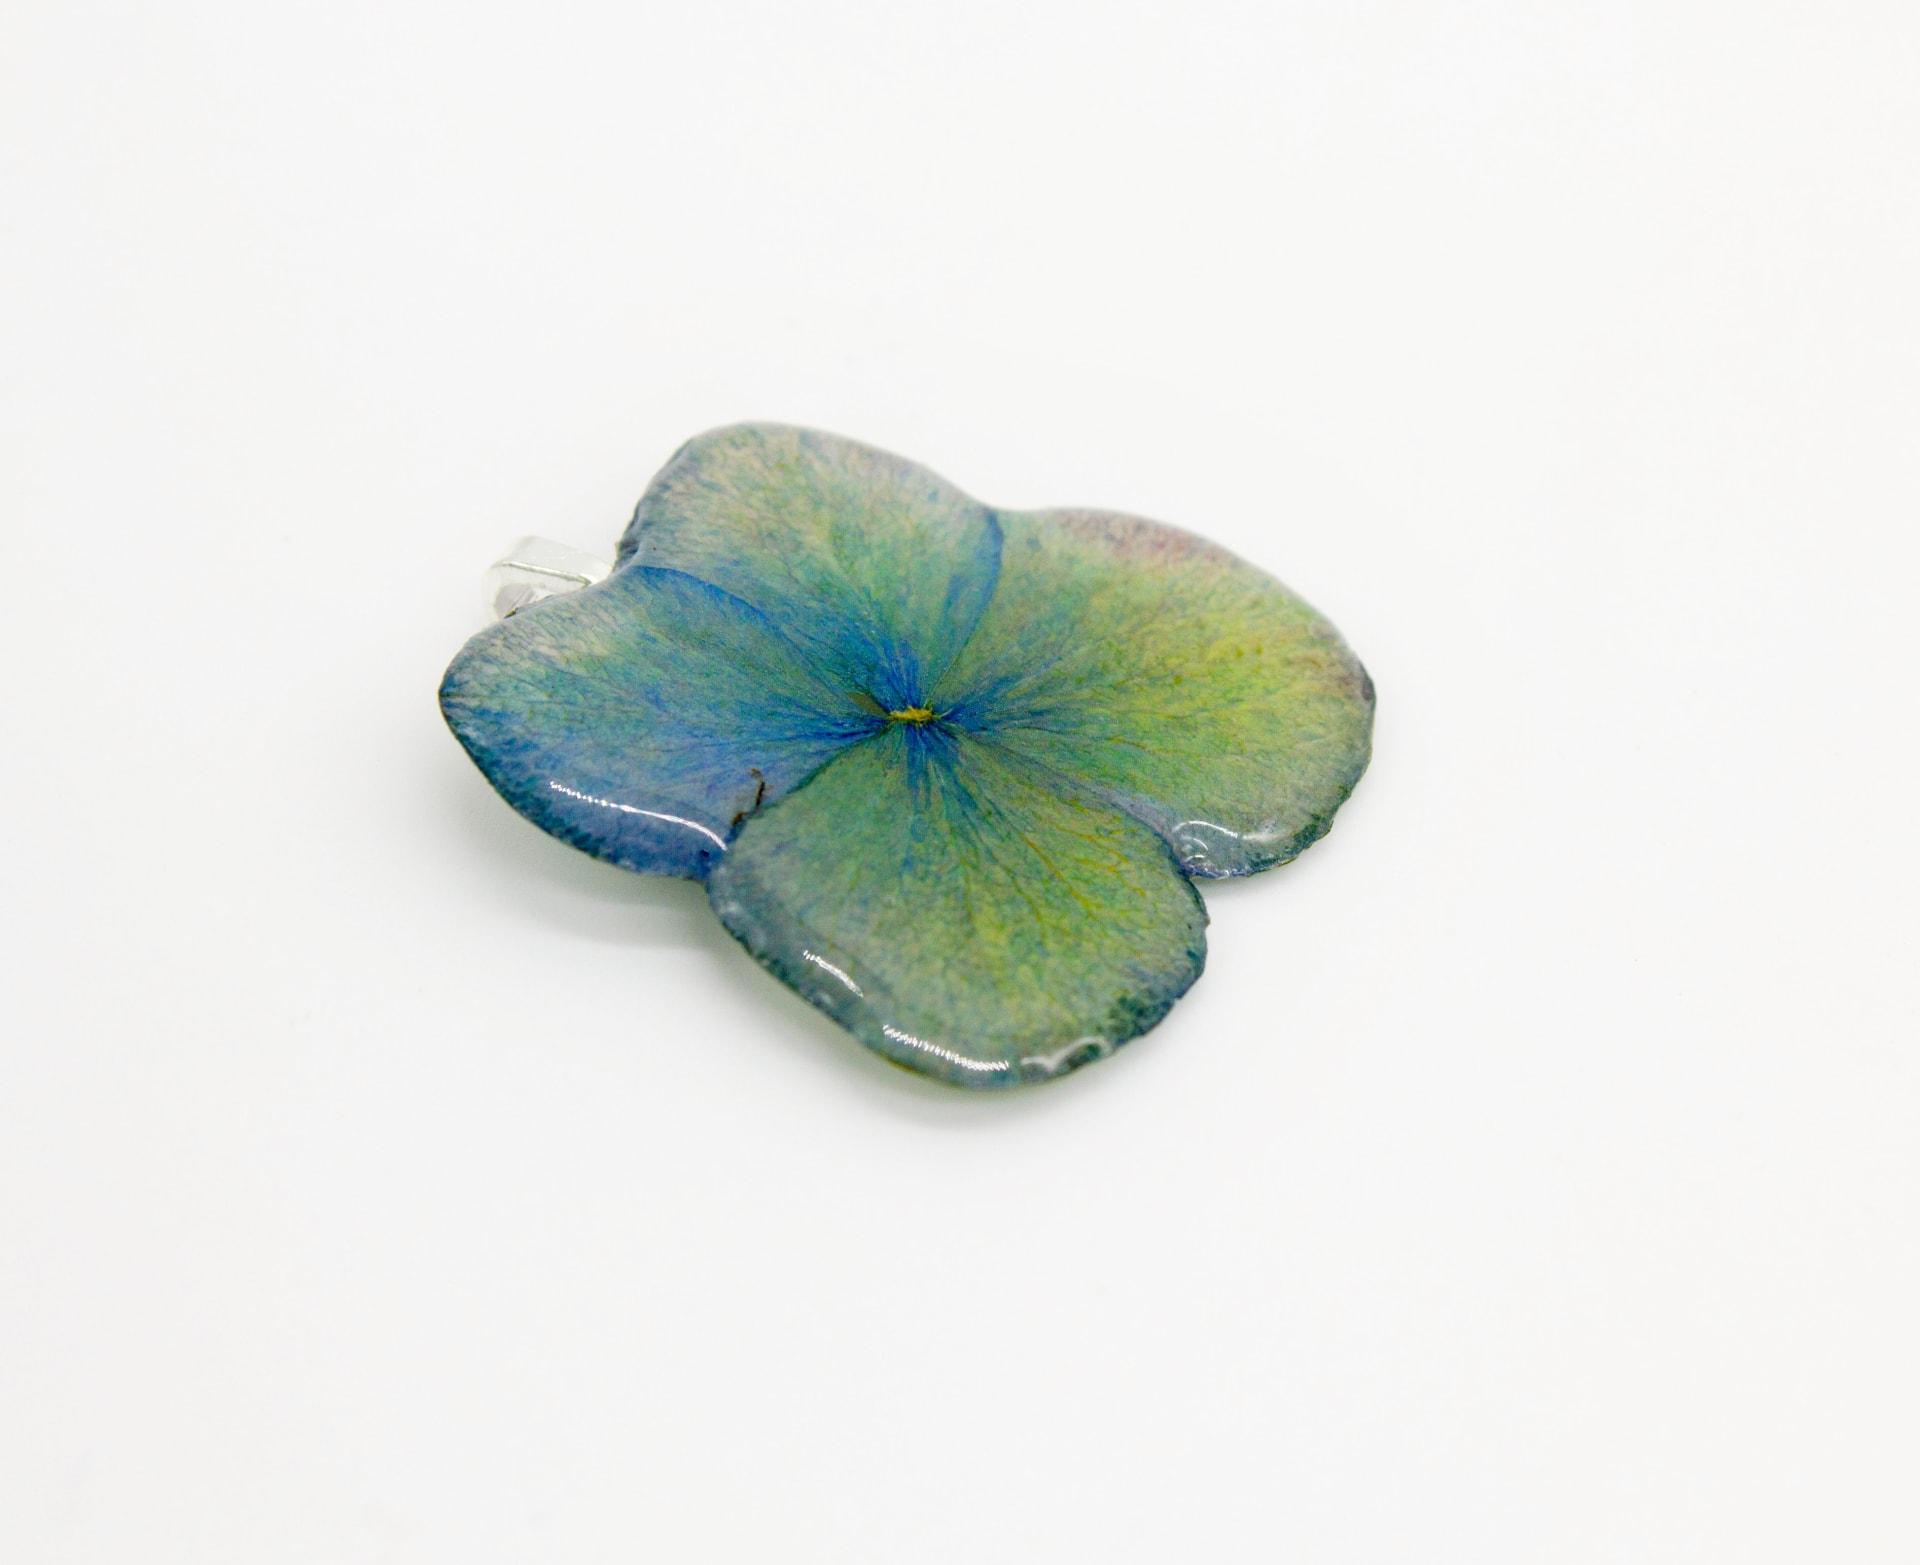 Mozes-Supposes-Pressed-Flower-Botanical-Jewelry_Image-1-w1920.jpg